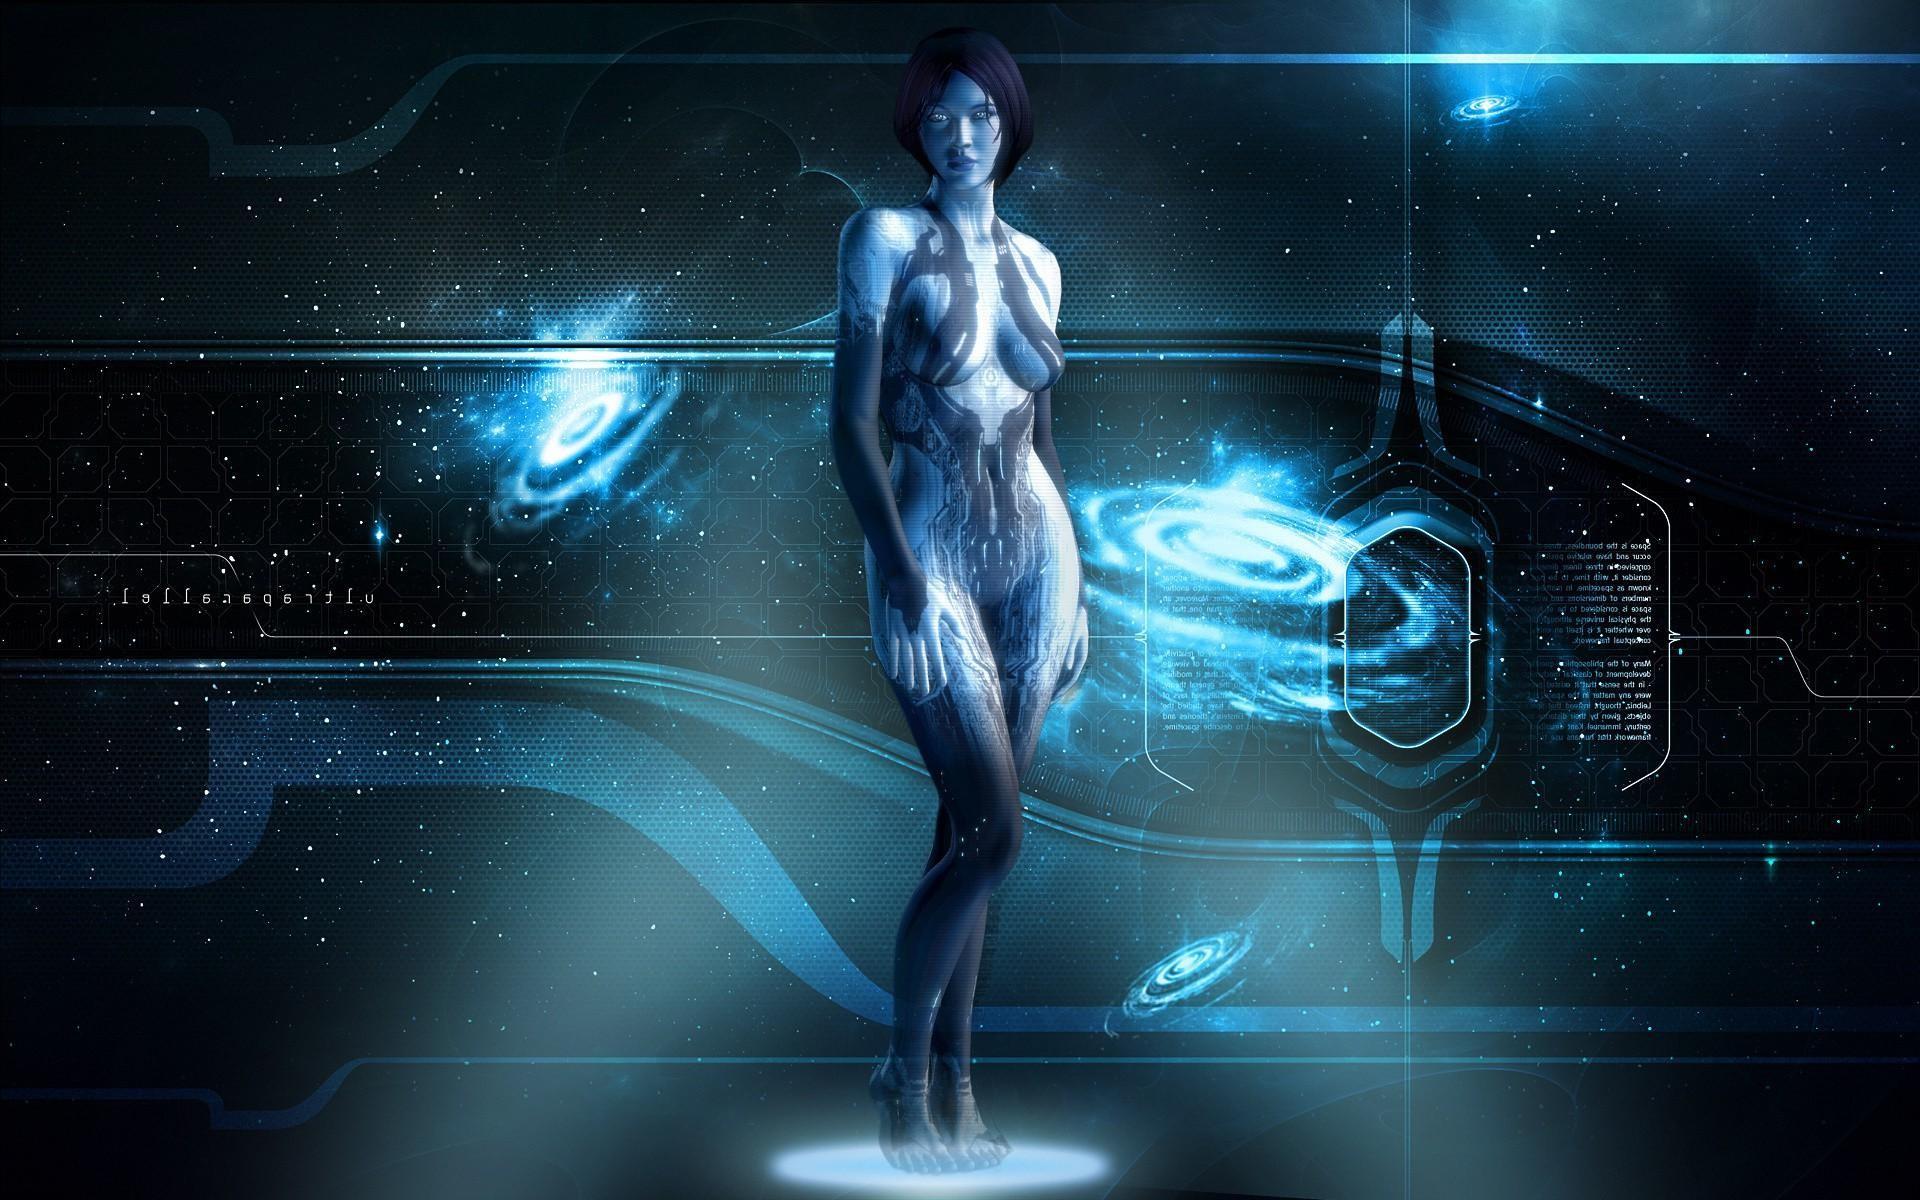 Halo 5 Cortana Wallpaper 81 images 1920x1200